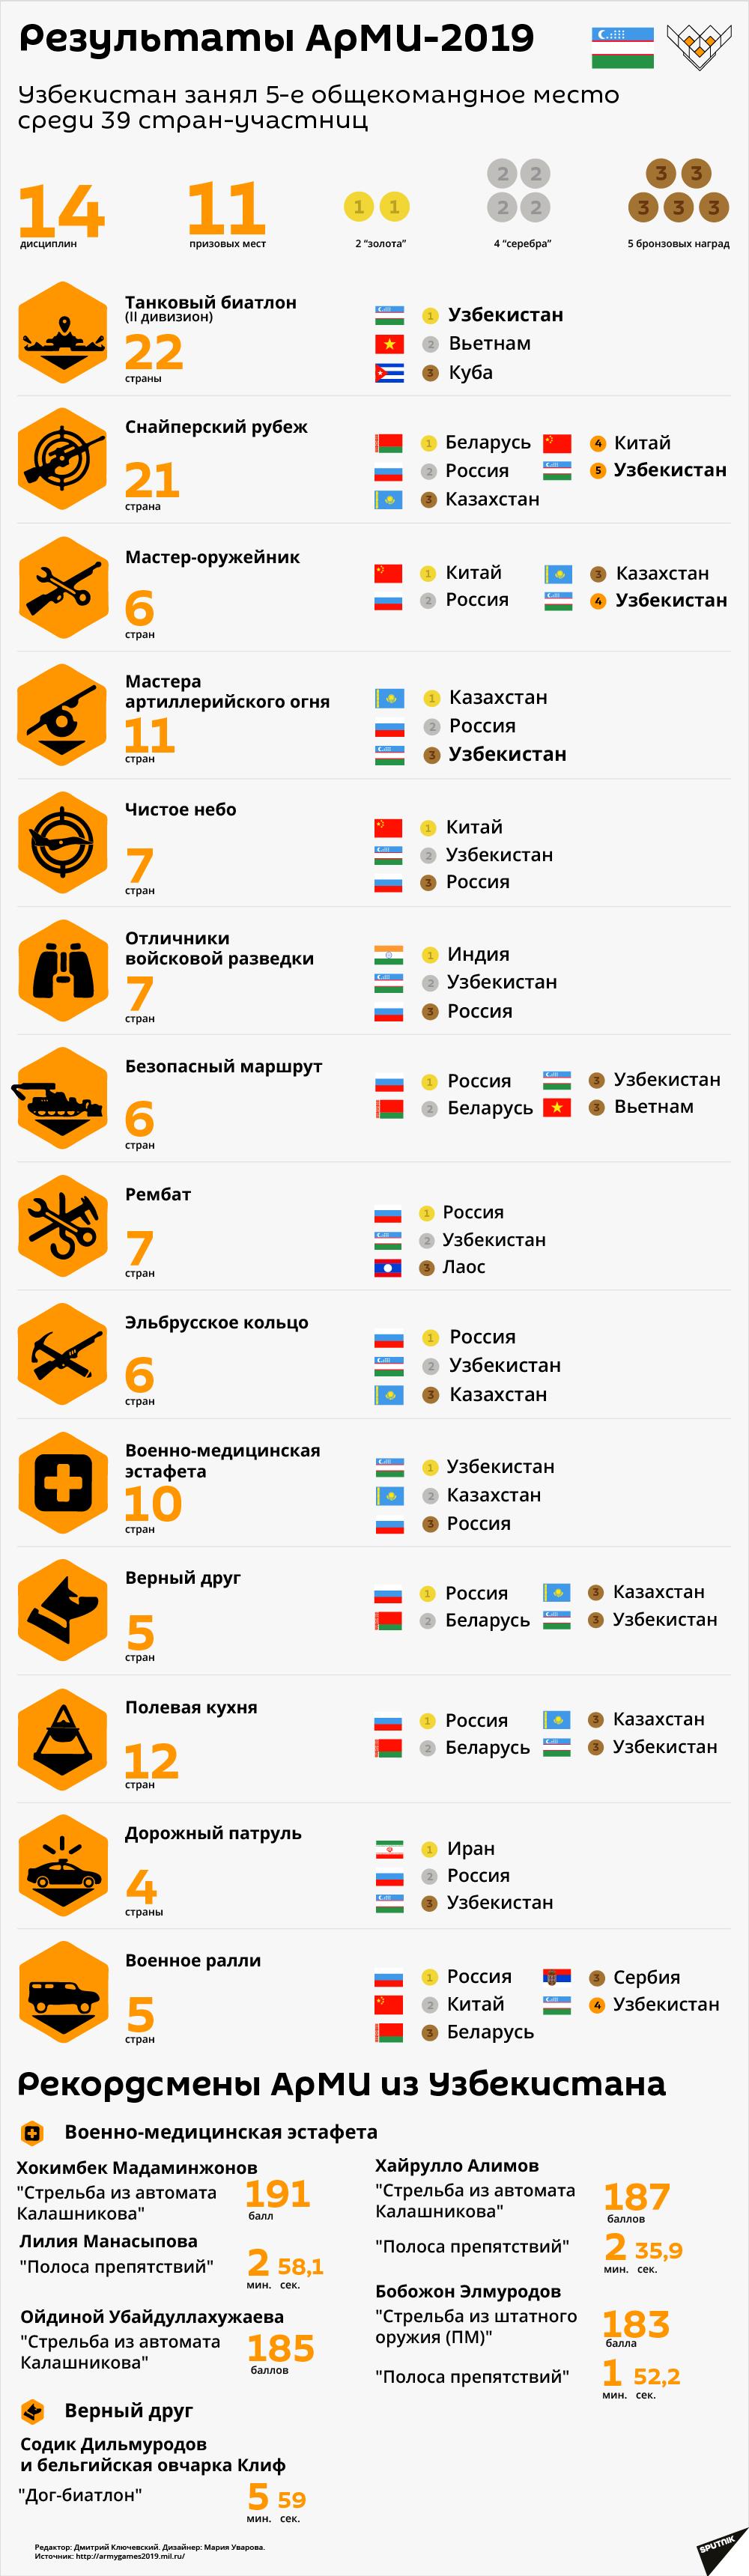 АрМИ-2019 результаты - Sputnik Узбекистан